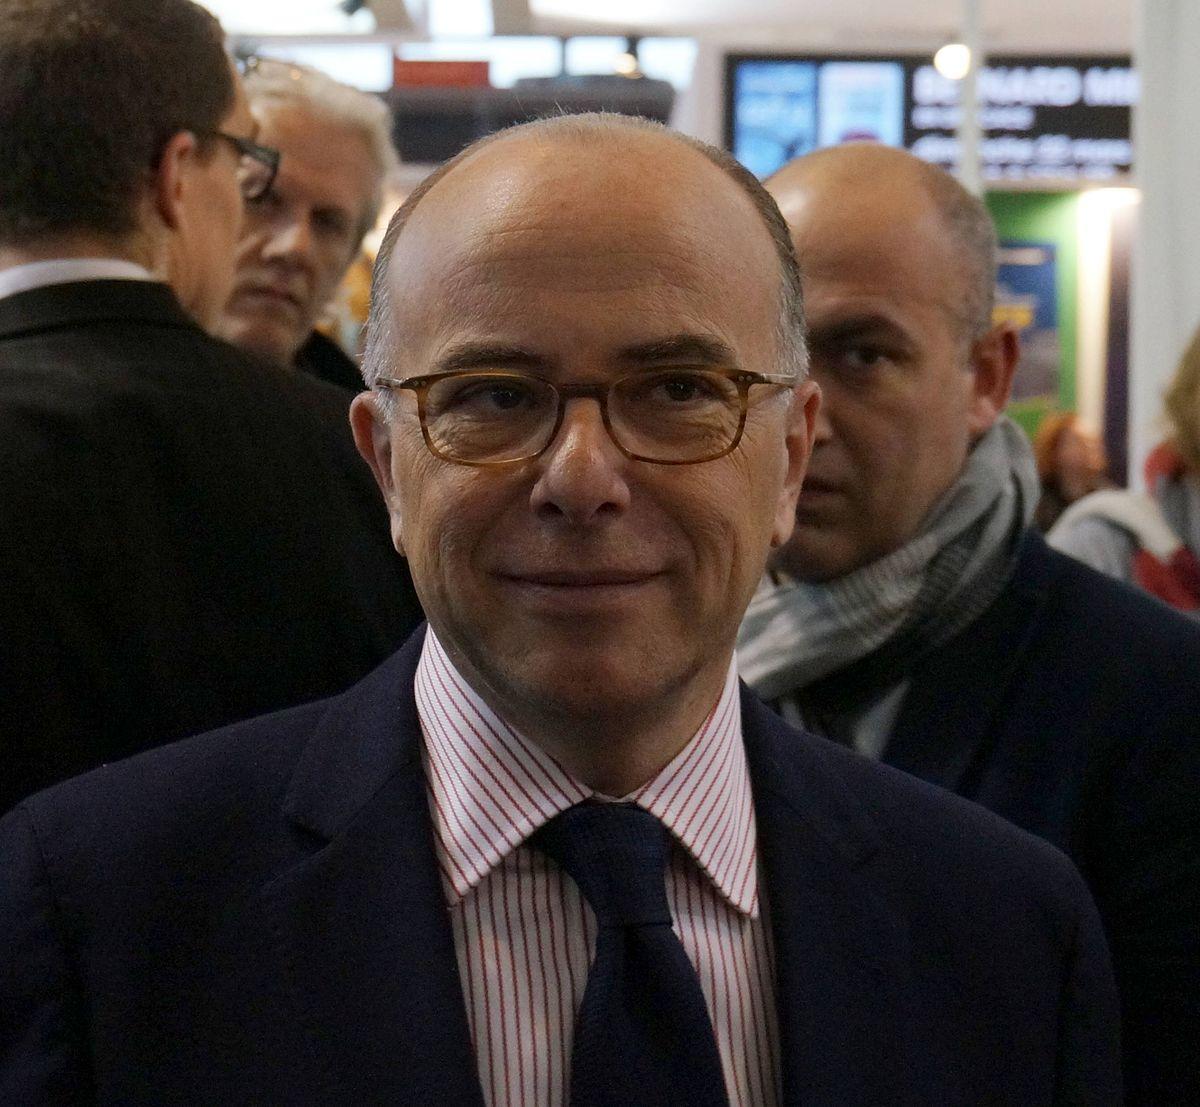 Bernard cazeneuve wikip dia - Cabinet du ministre de l interieur ...